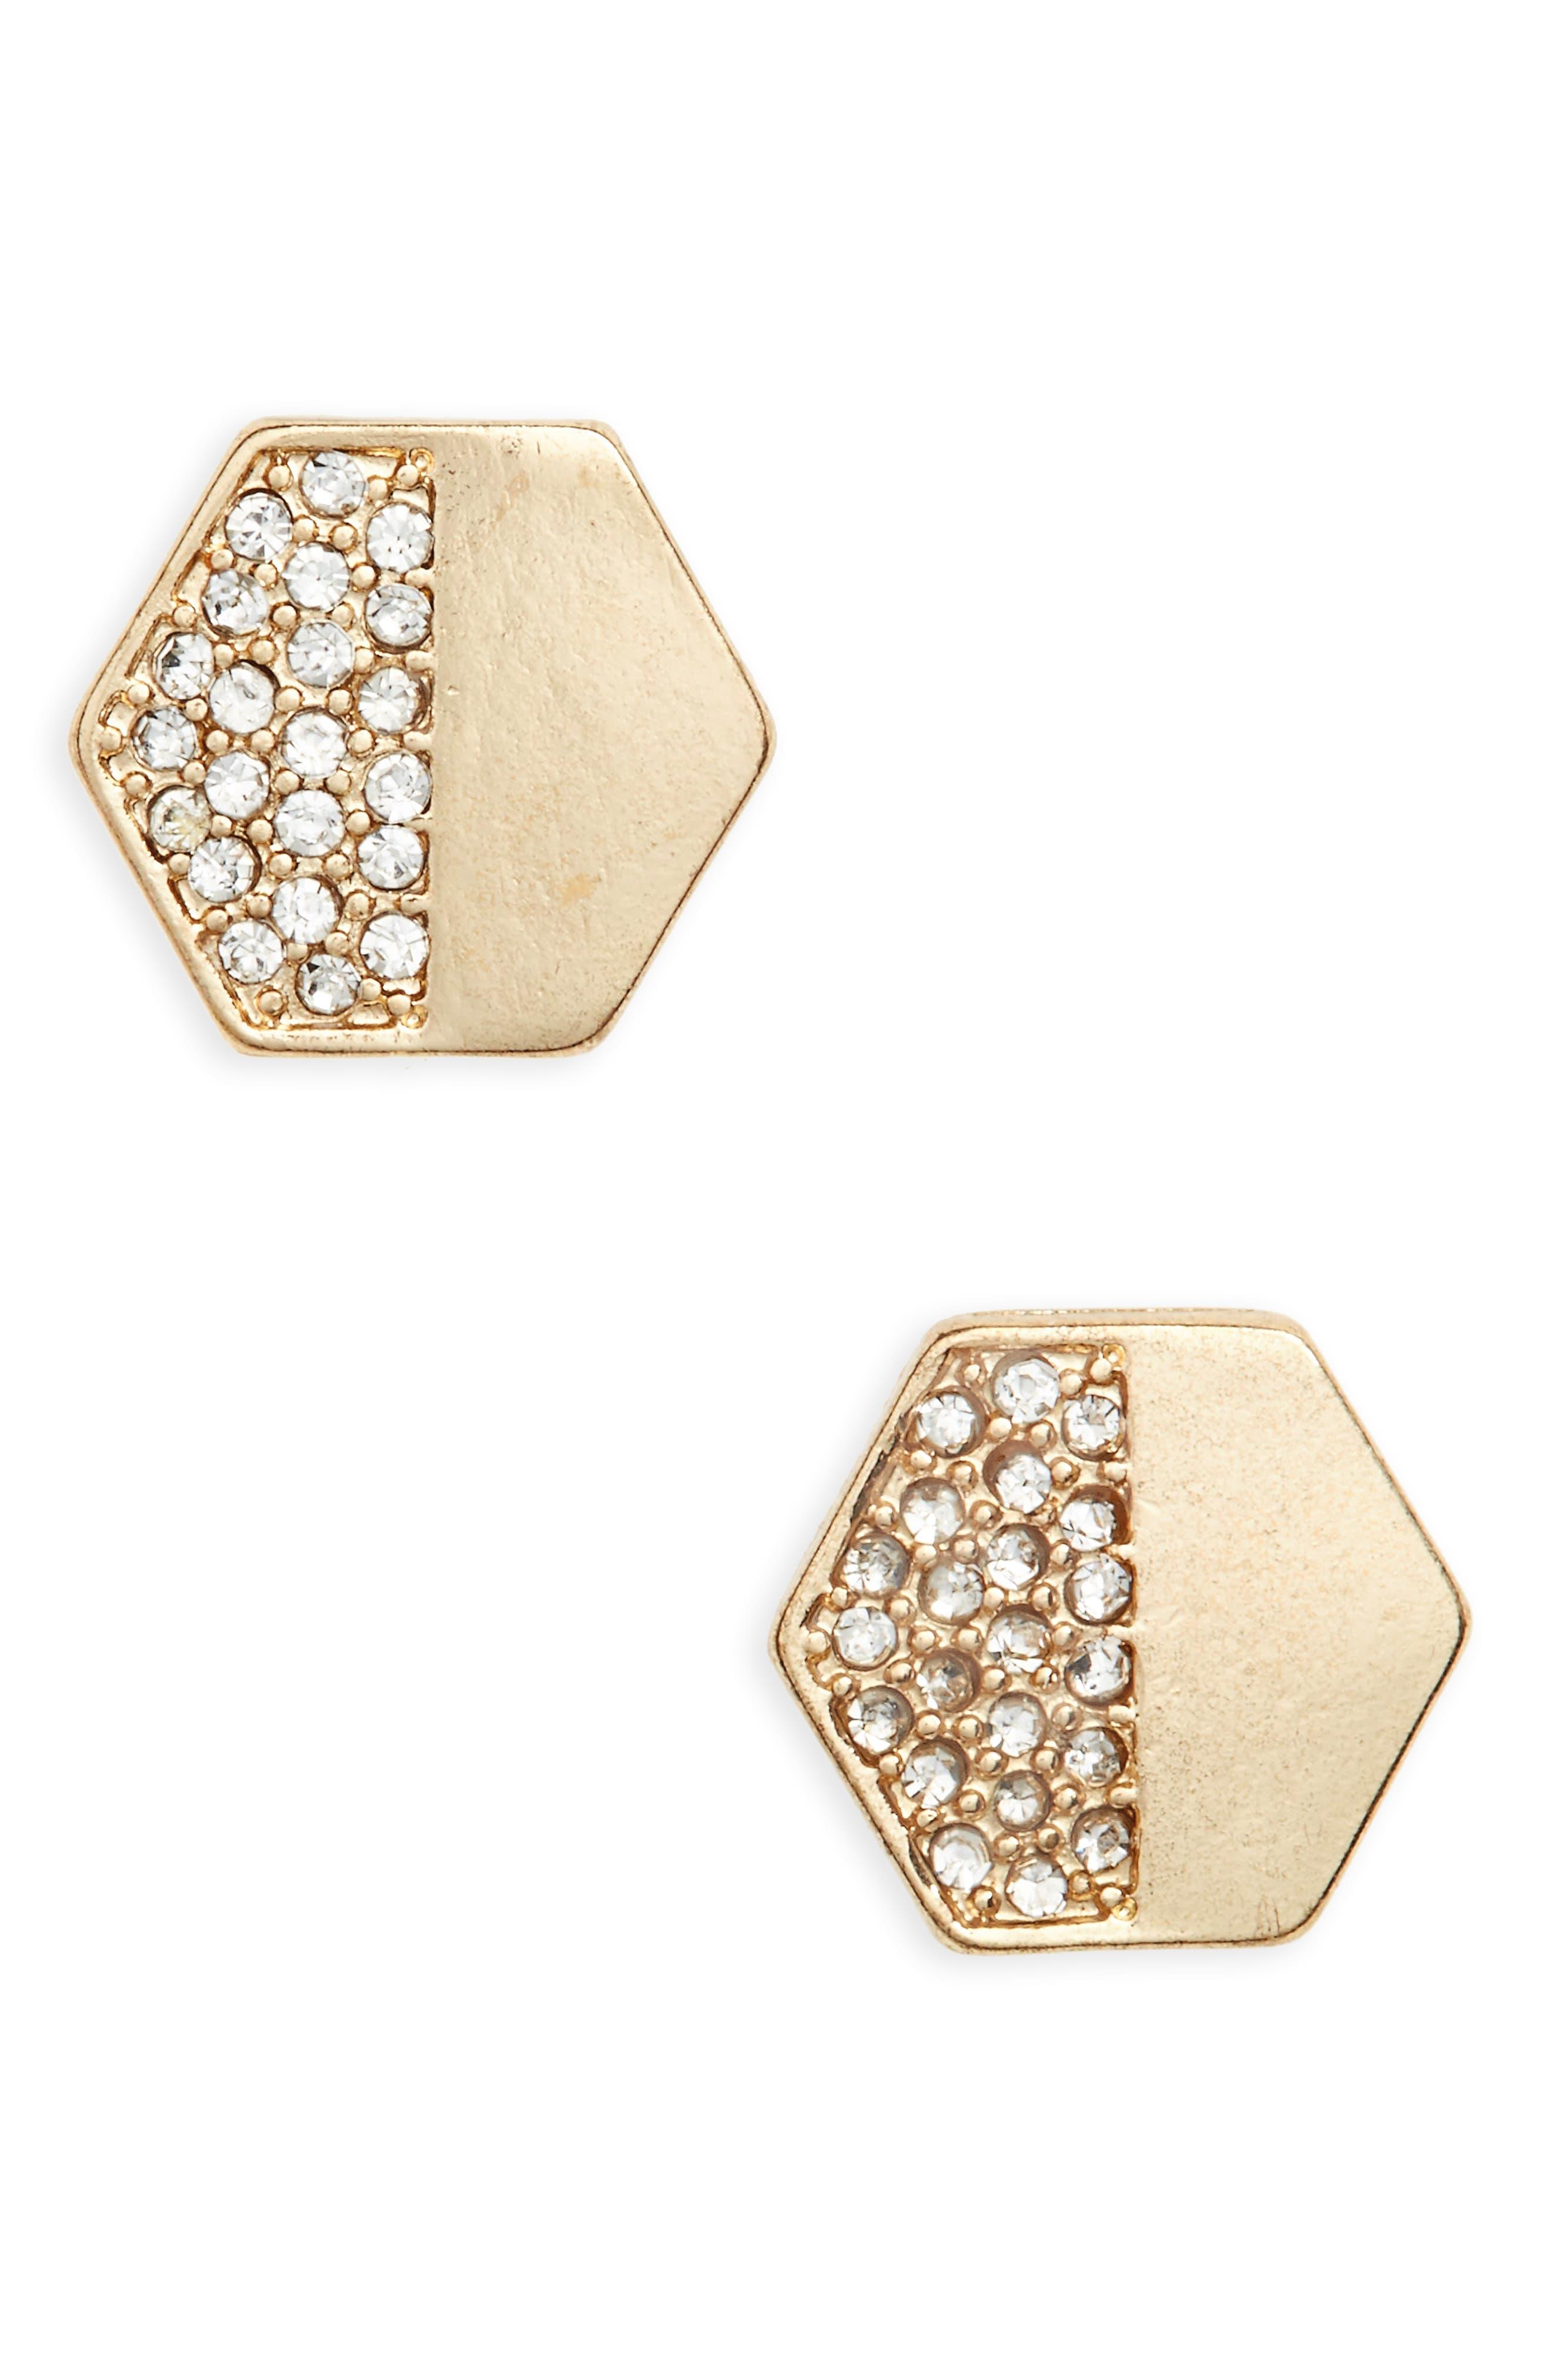 Crystal Hexagon Stud Earrings,                             Main thumbnail 1, color,                             Gold/ Crystal